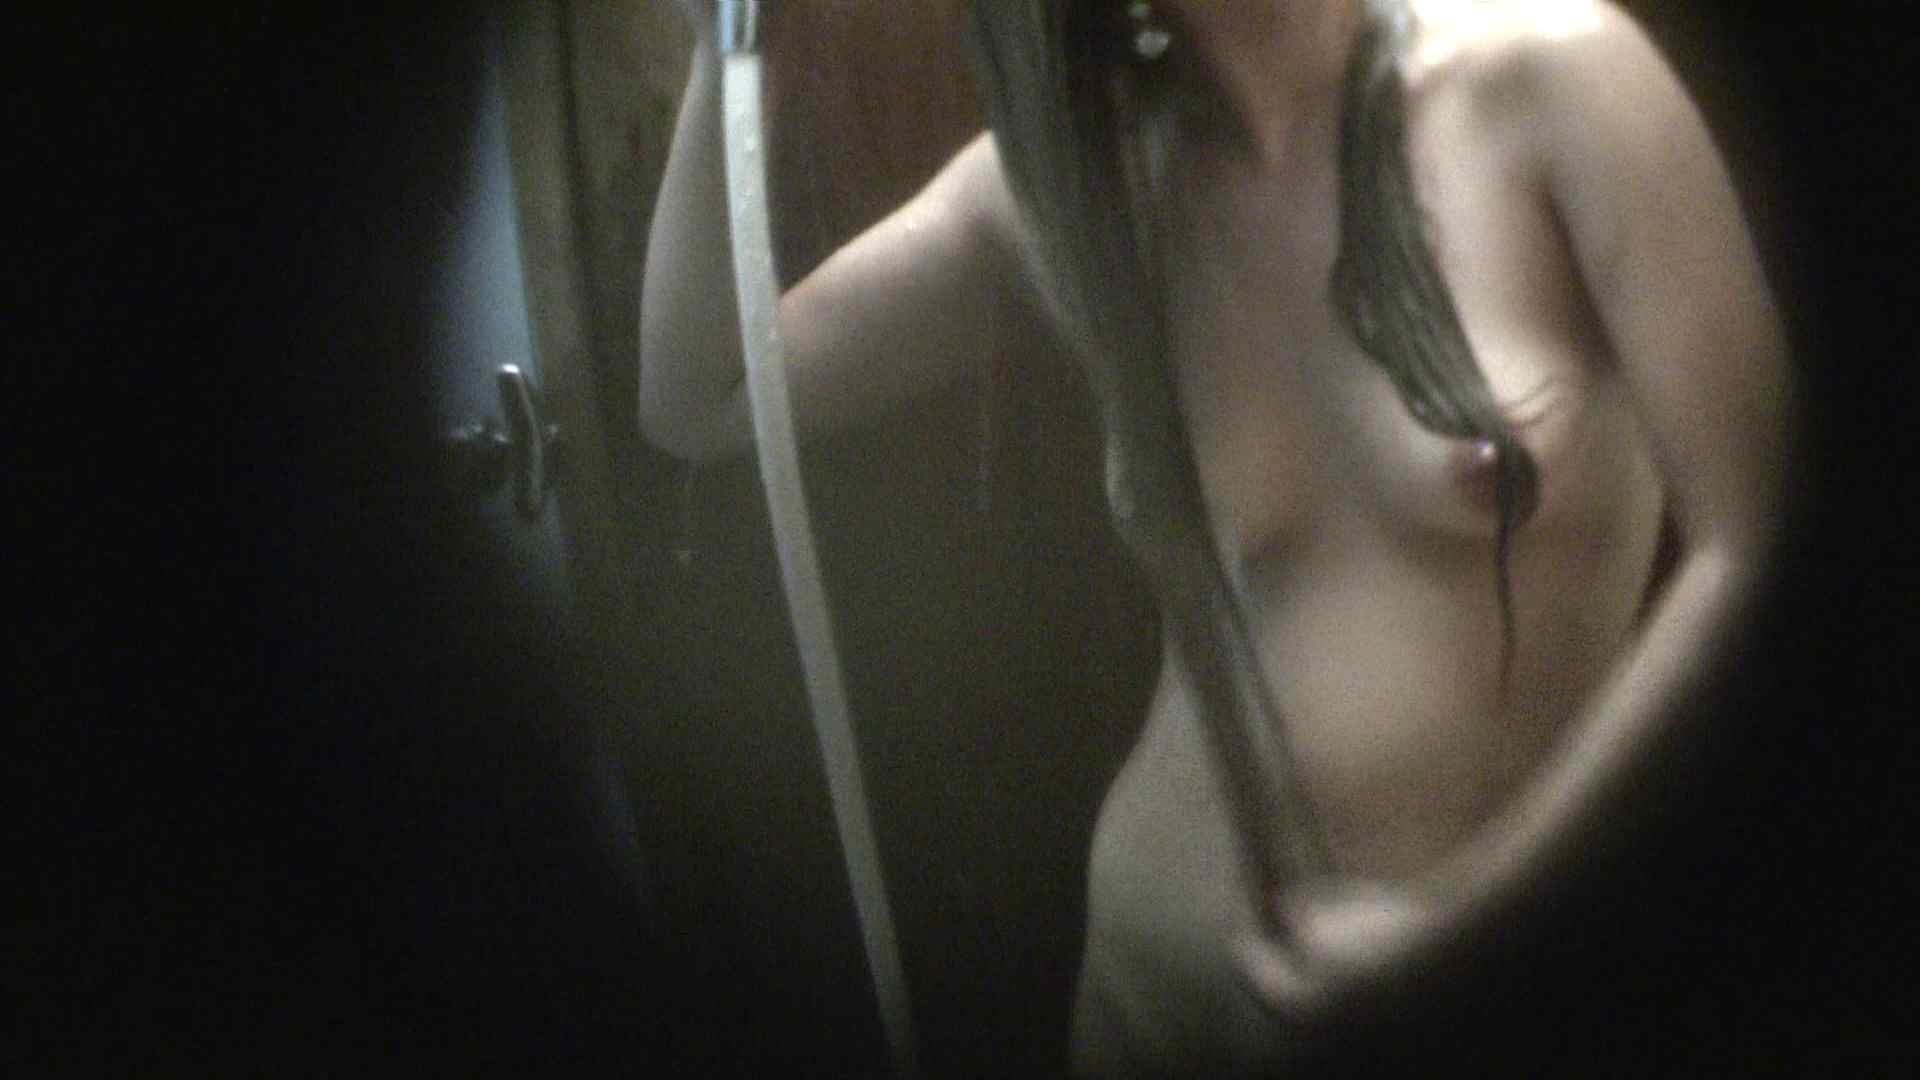 NO.03 ムッチリ色白ボディーに少し大きな乳輪 シャワー スケベ動画紹介 90枚 47